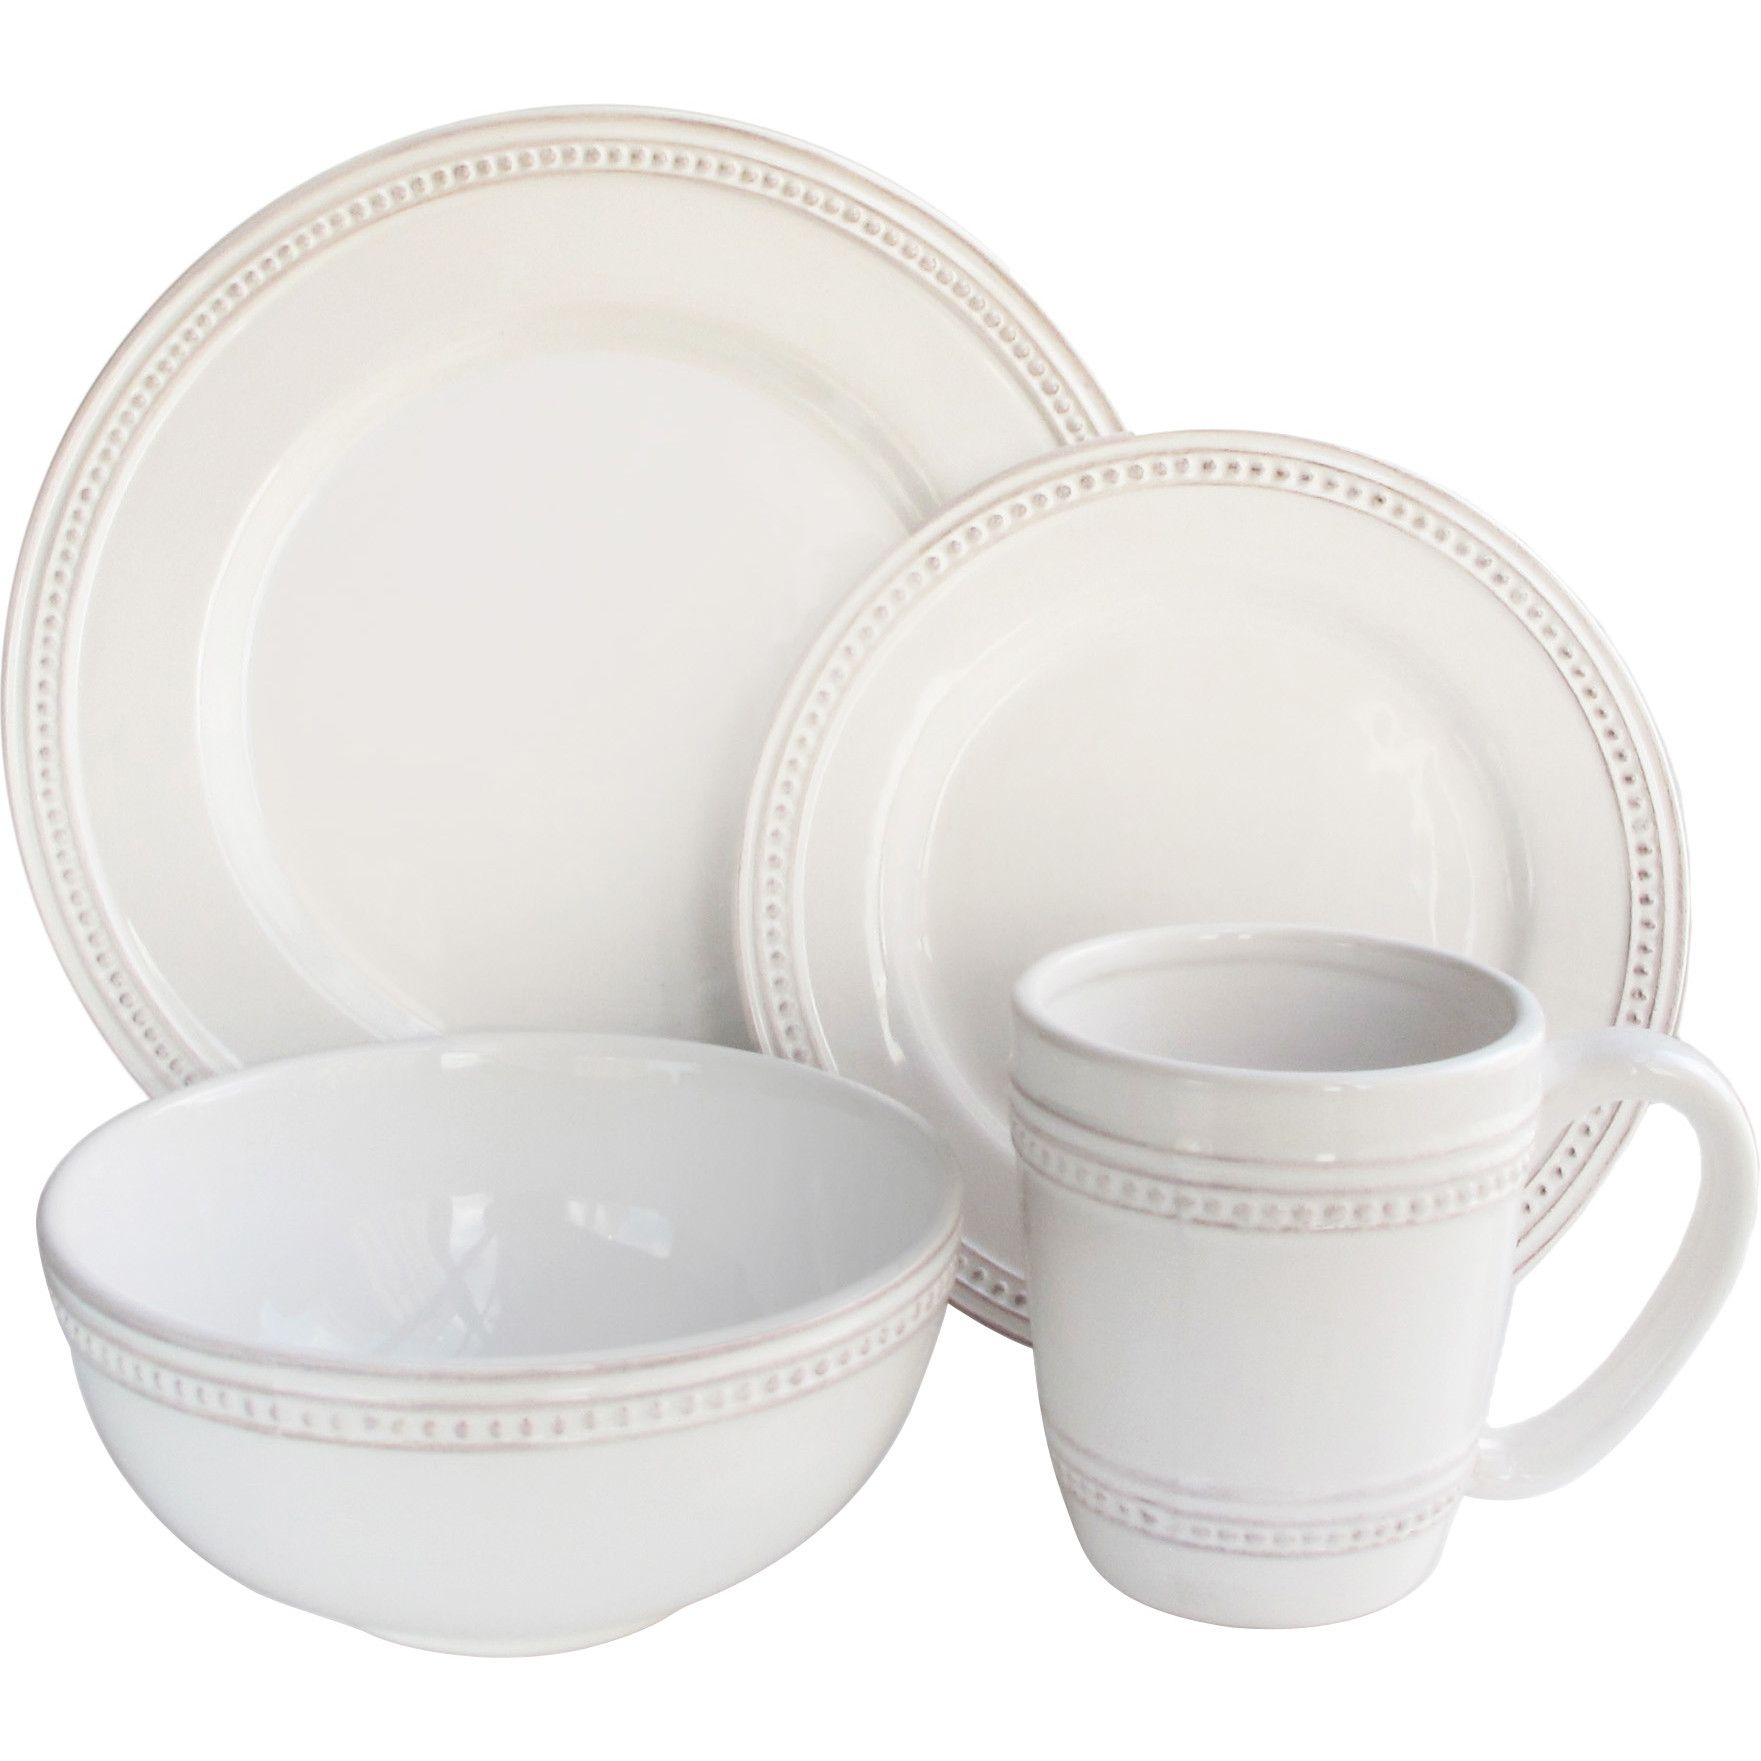 Hauser  Piece Dinnerware Set Service For